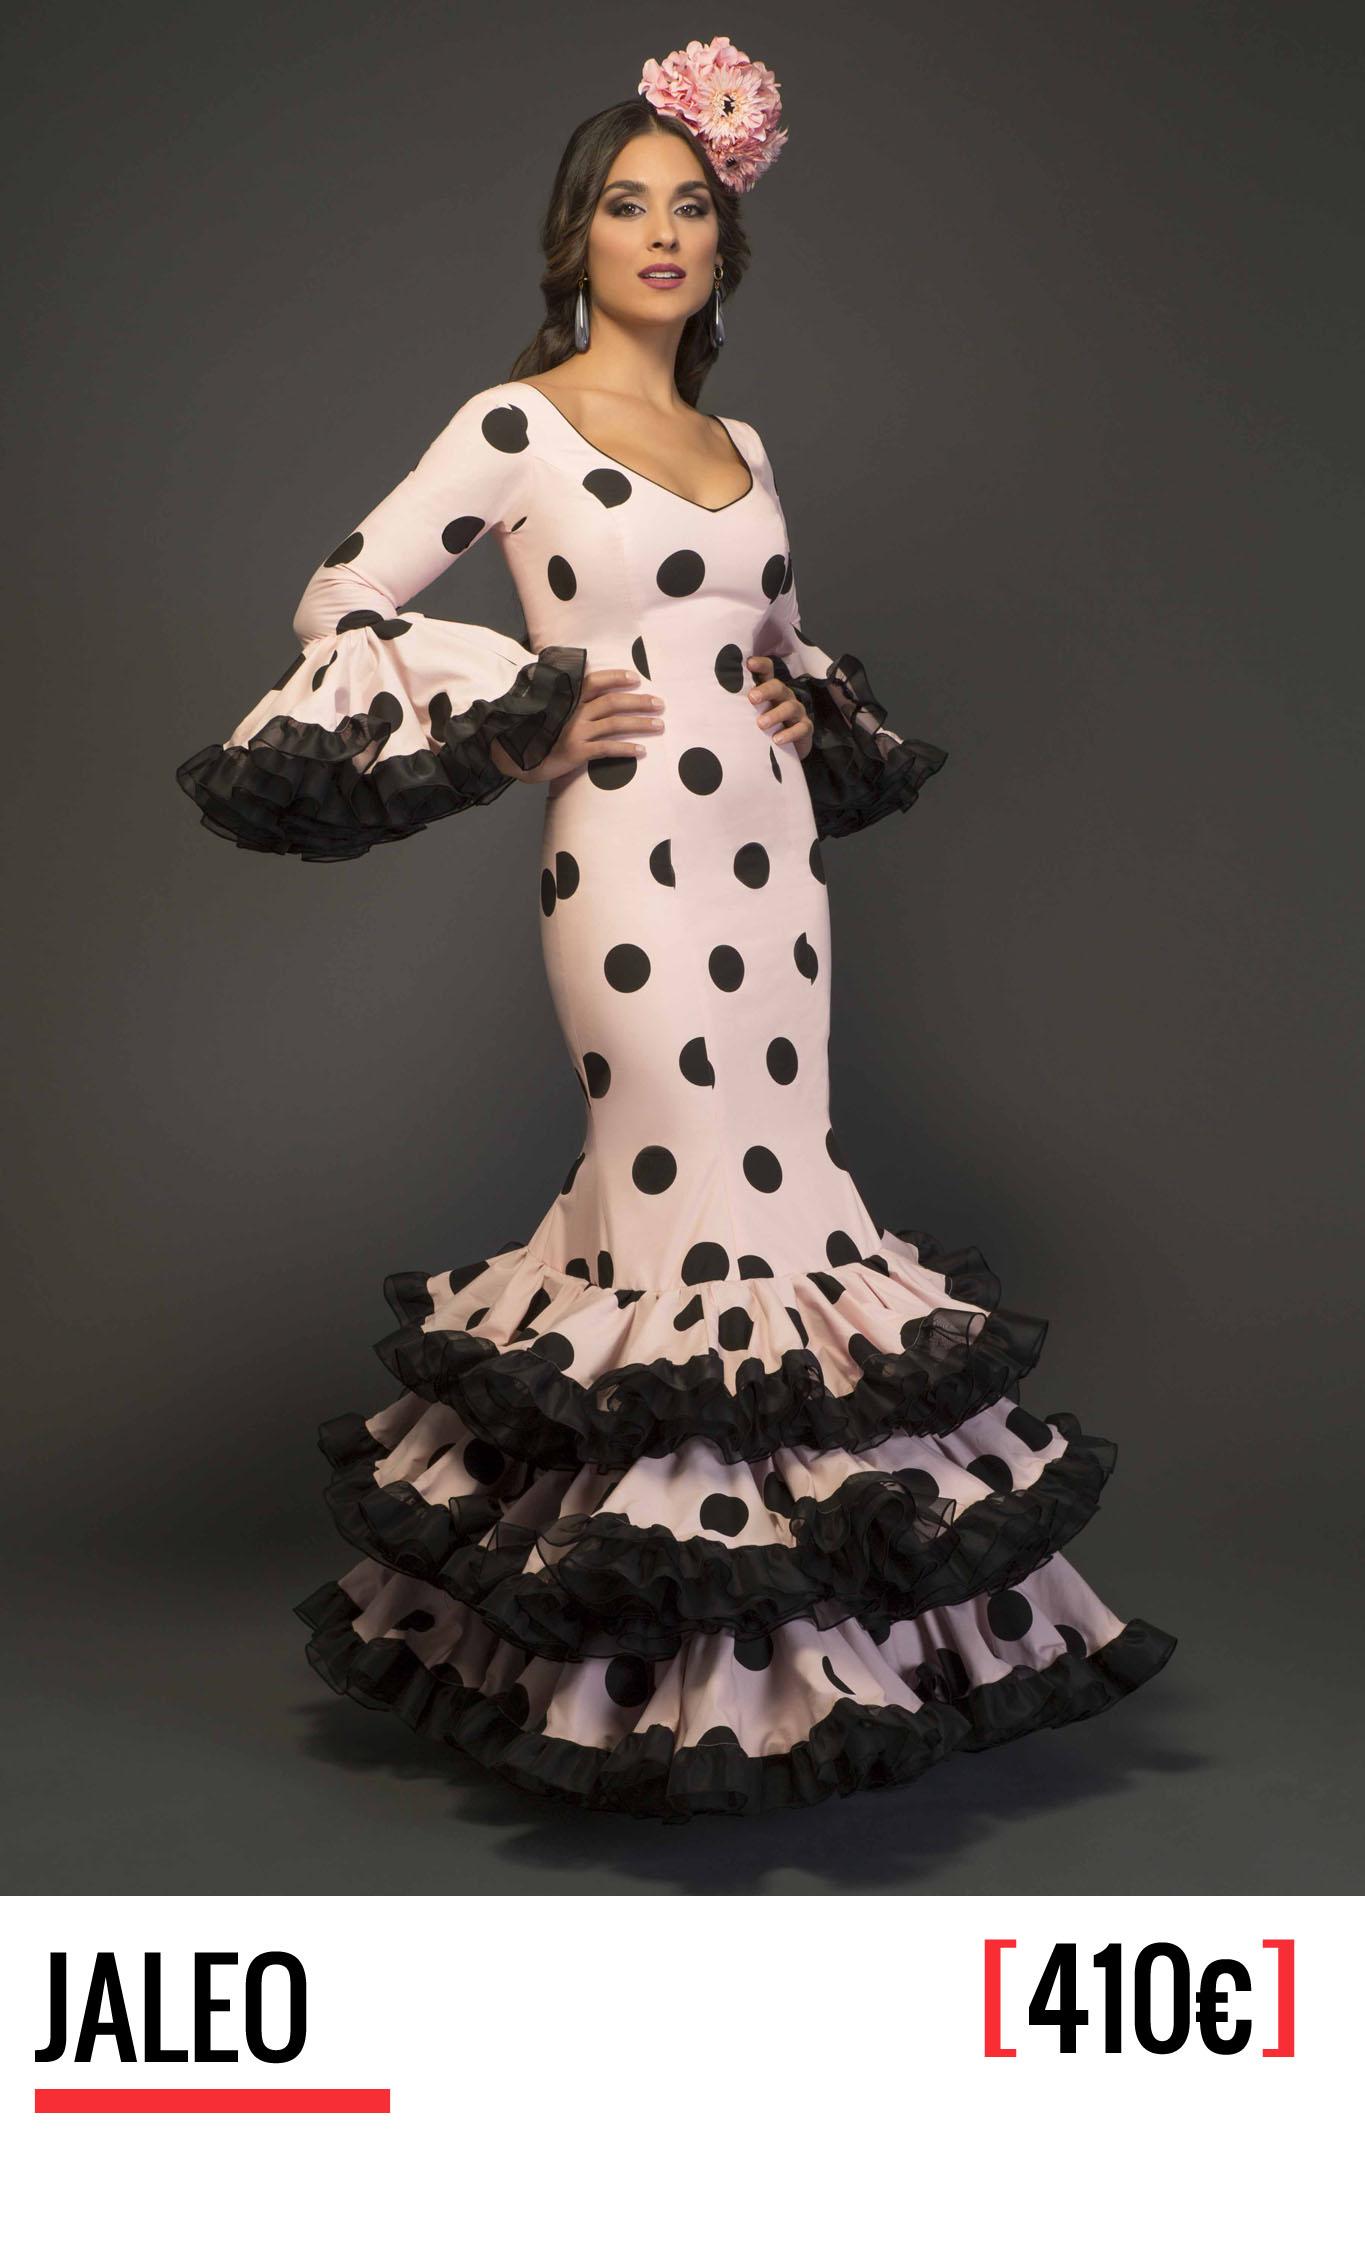 Trajes de flamenca baratos sevilla 2018 – Vestidos de boda 65fe9ab93d8